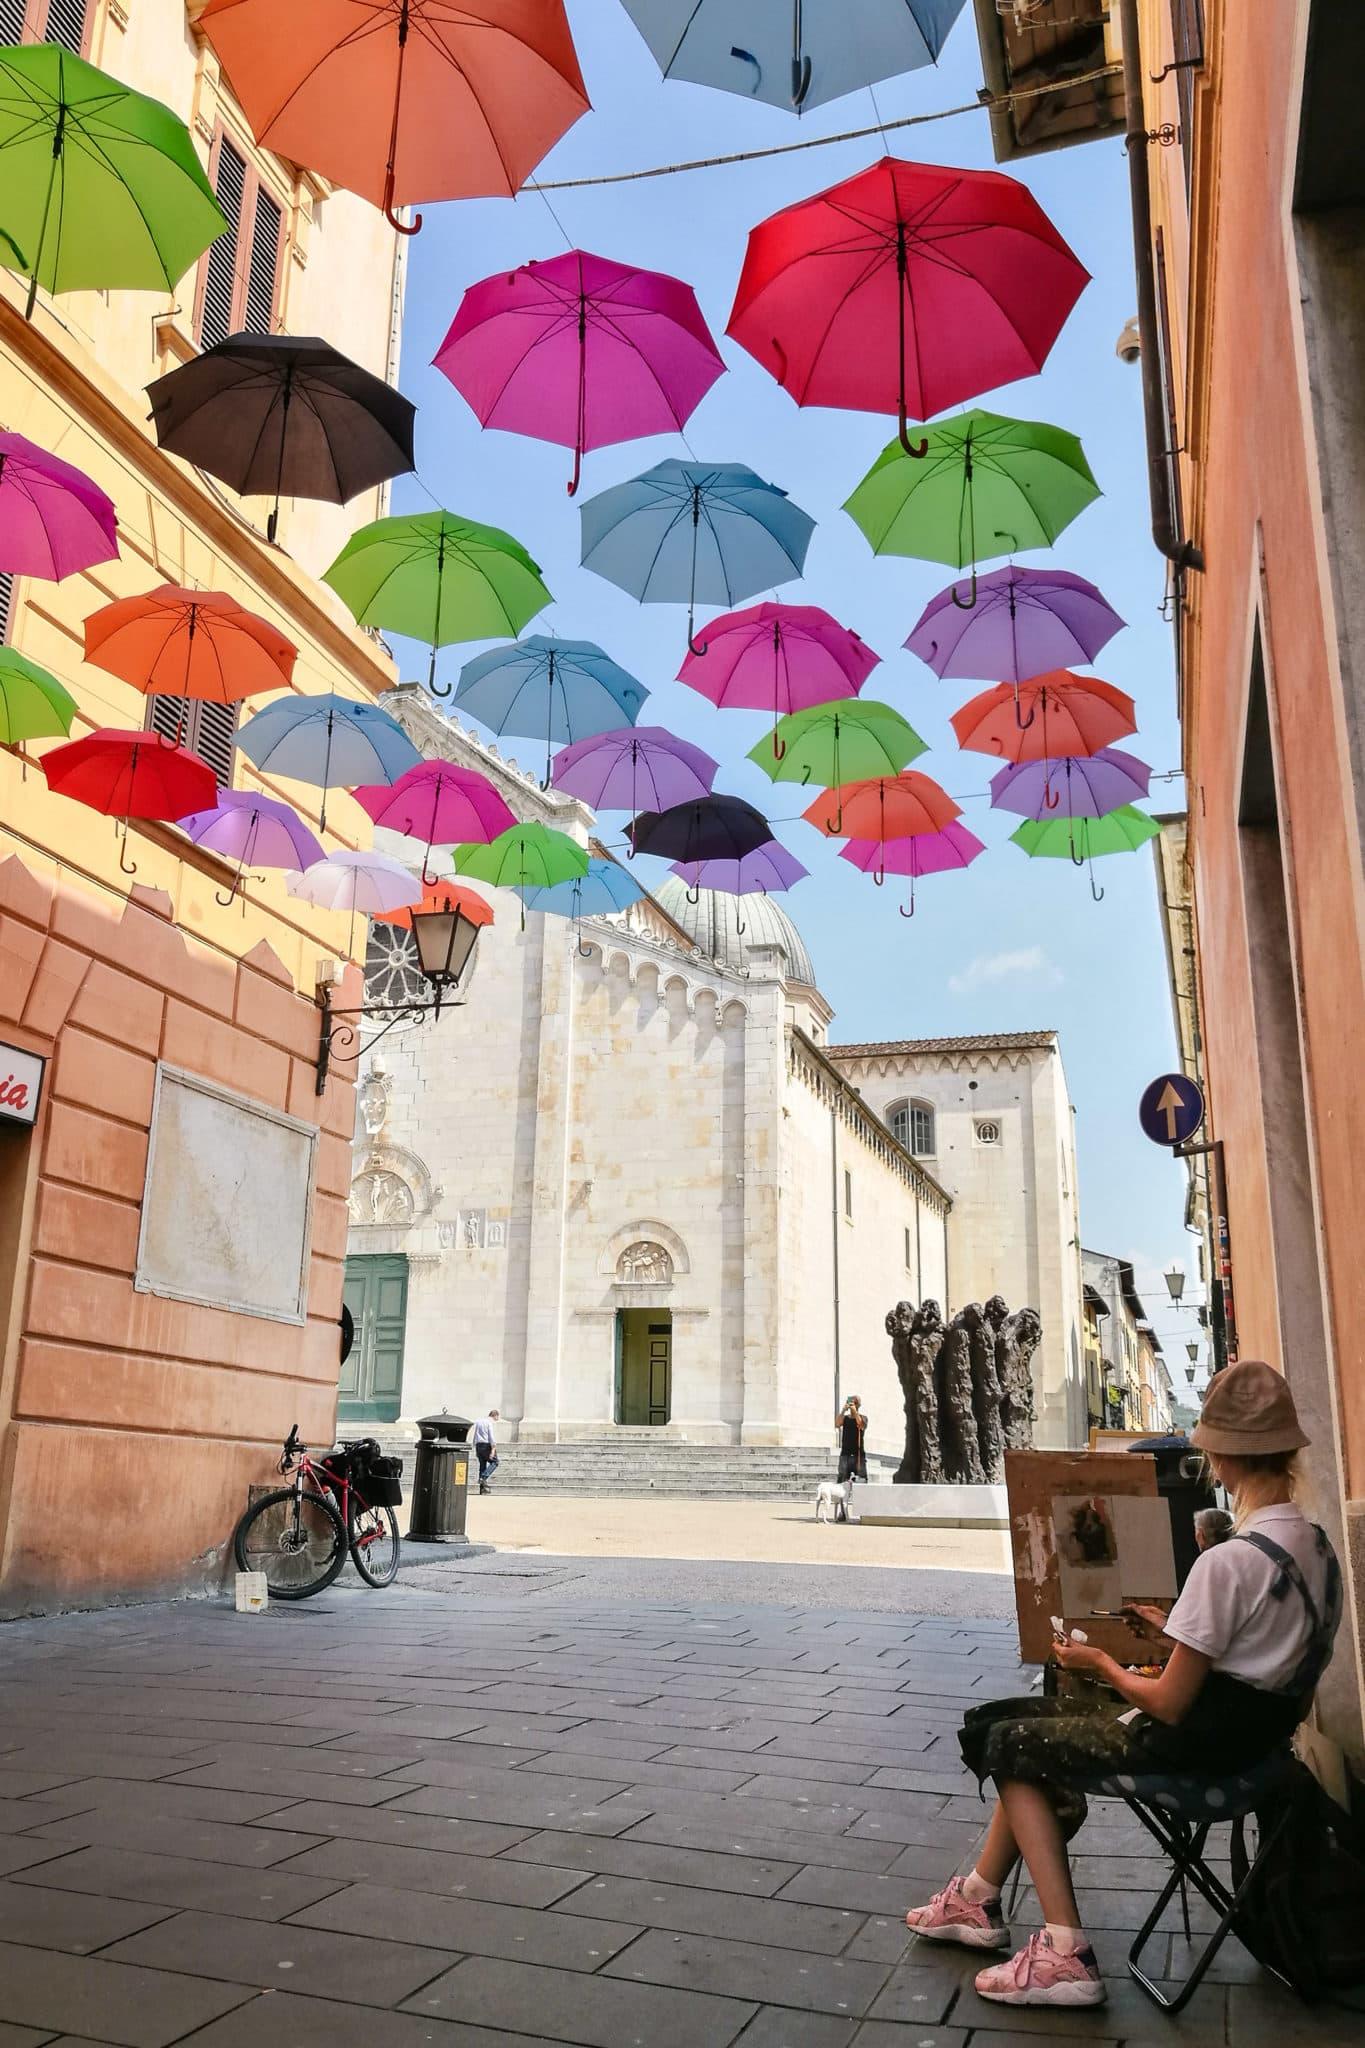 Painter under the floating umbrellas in Pietrasanta